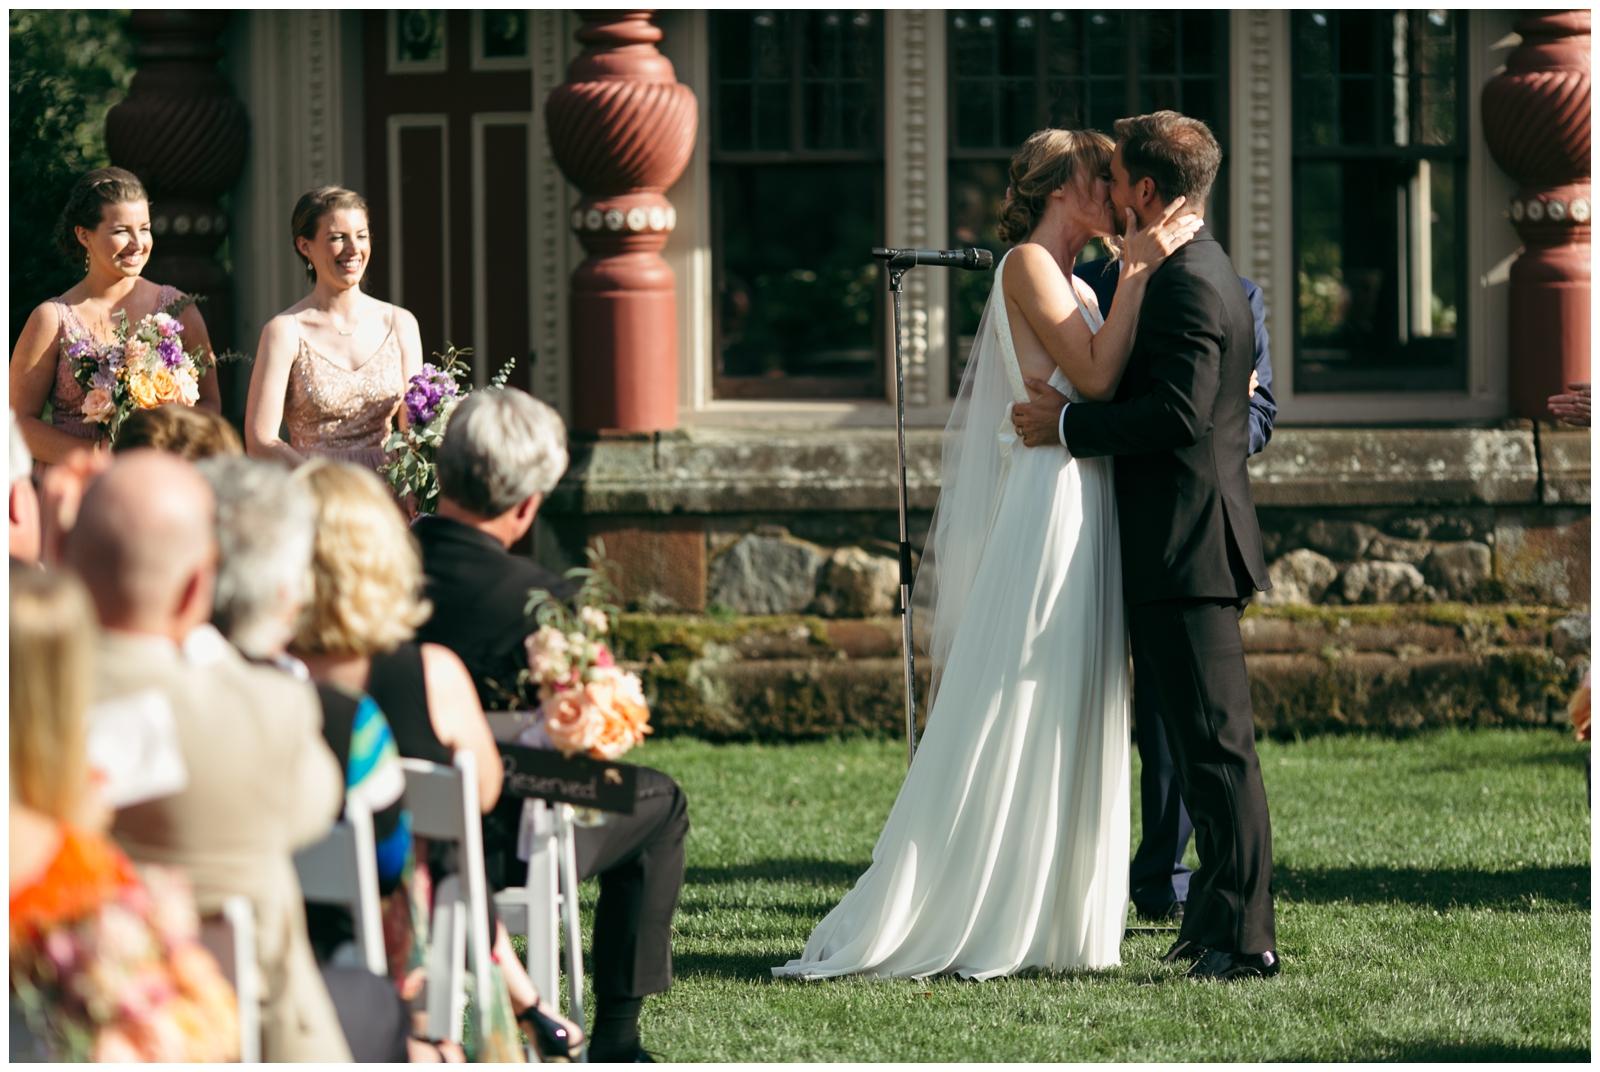 Moraine-Farm-wedding-Bailey-Q-Photo-Massachusetts-wedding-photpgrapher-077.jpg